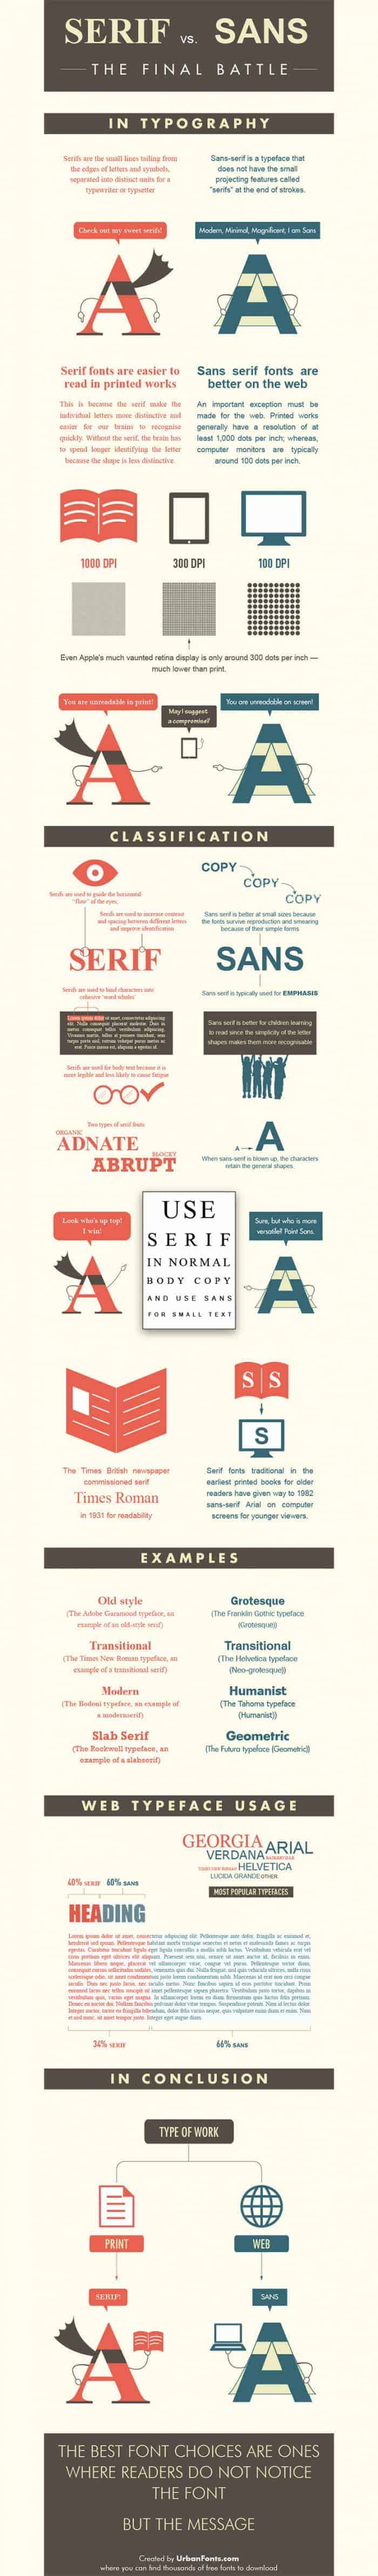 Serif vs. Sans Infographic